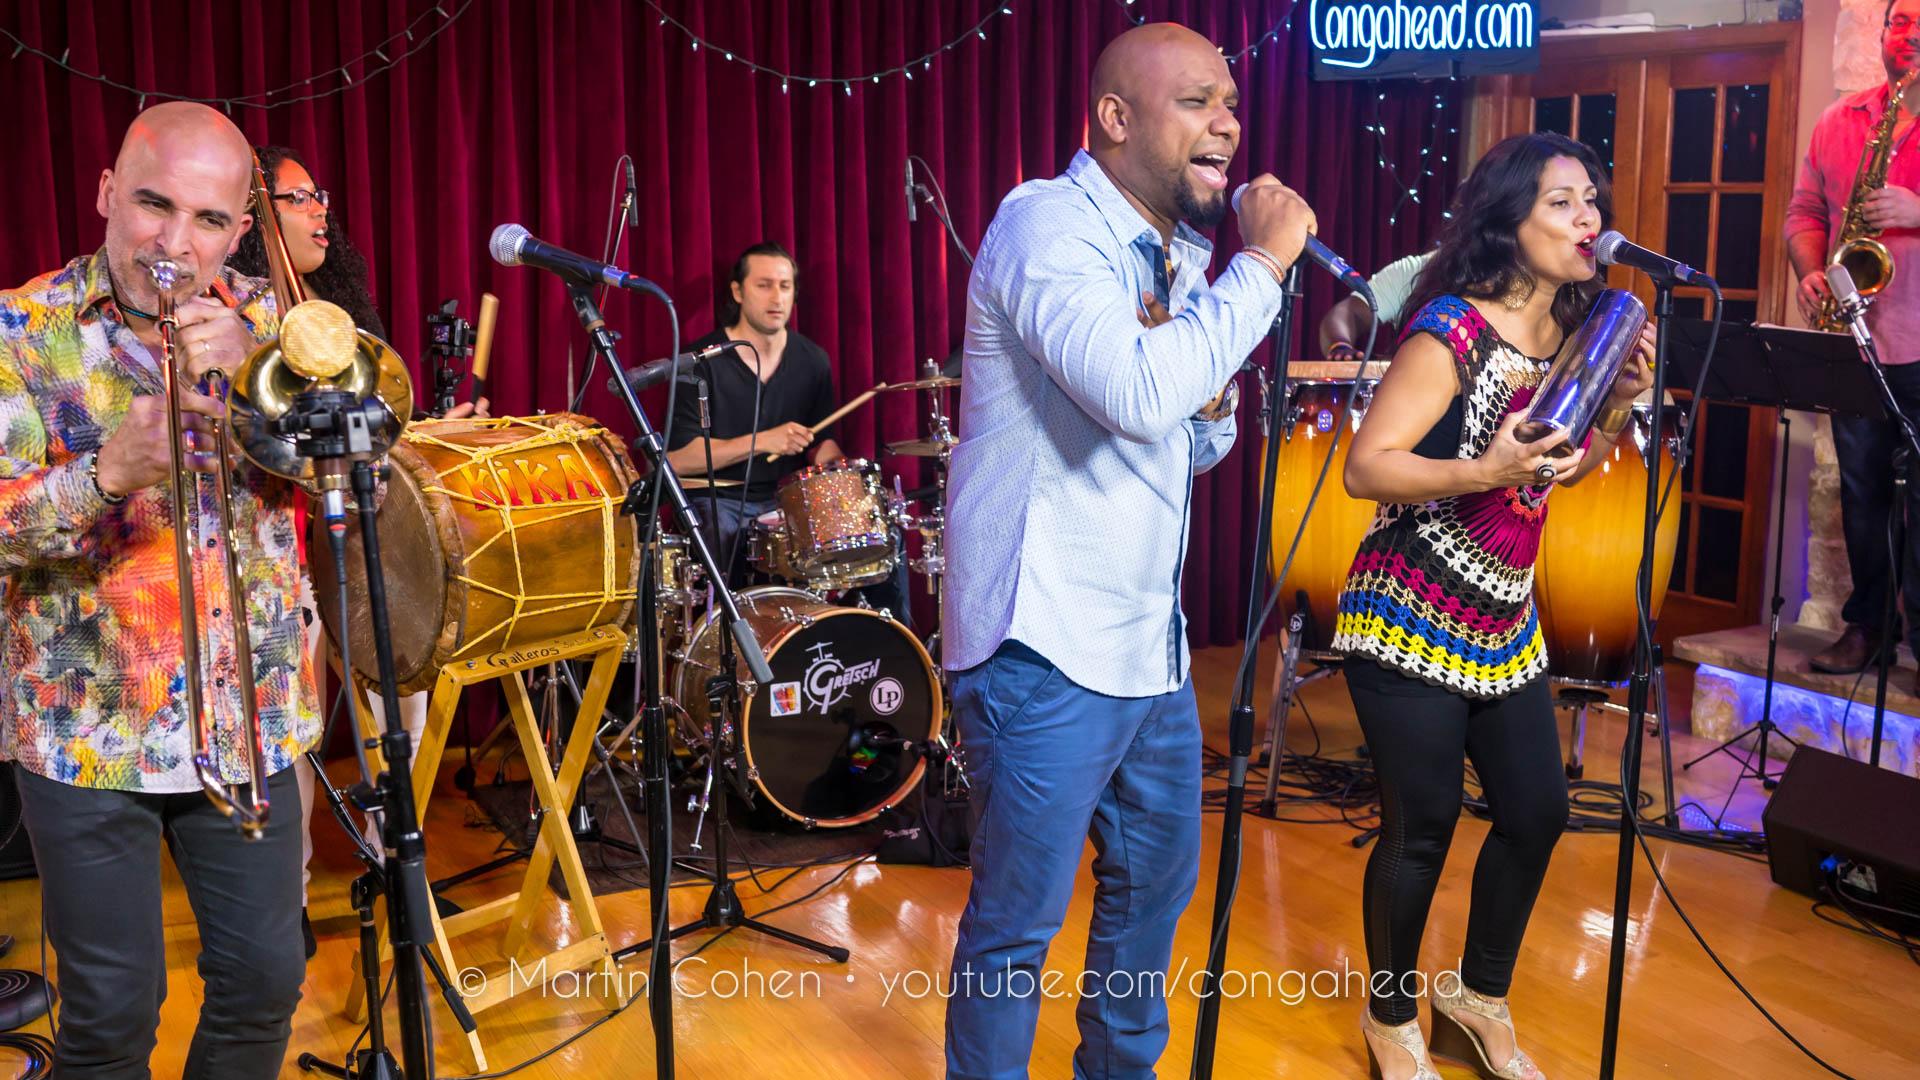 Grupo Rebolu Ft. Jimmy Bosch & Edmar Castaneda perform at Congahead Studios